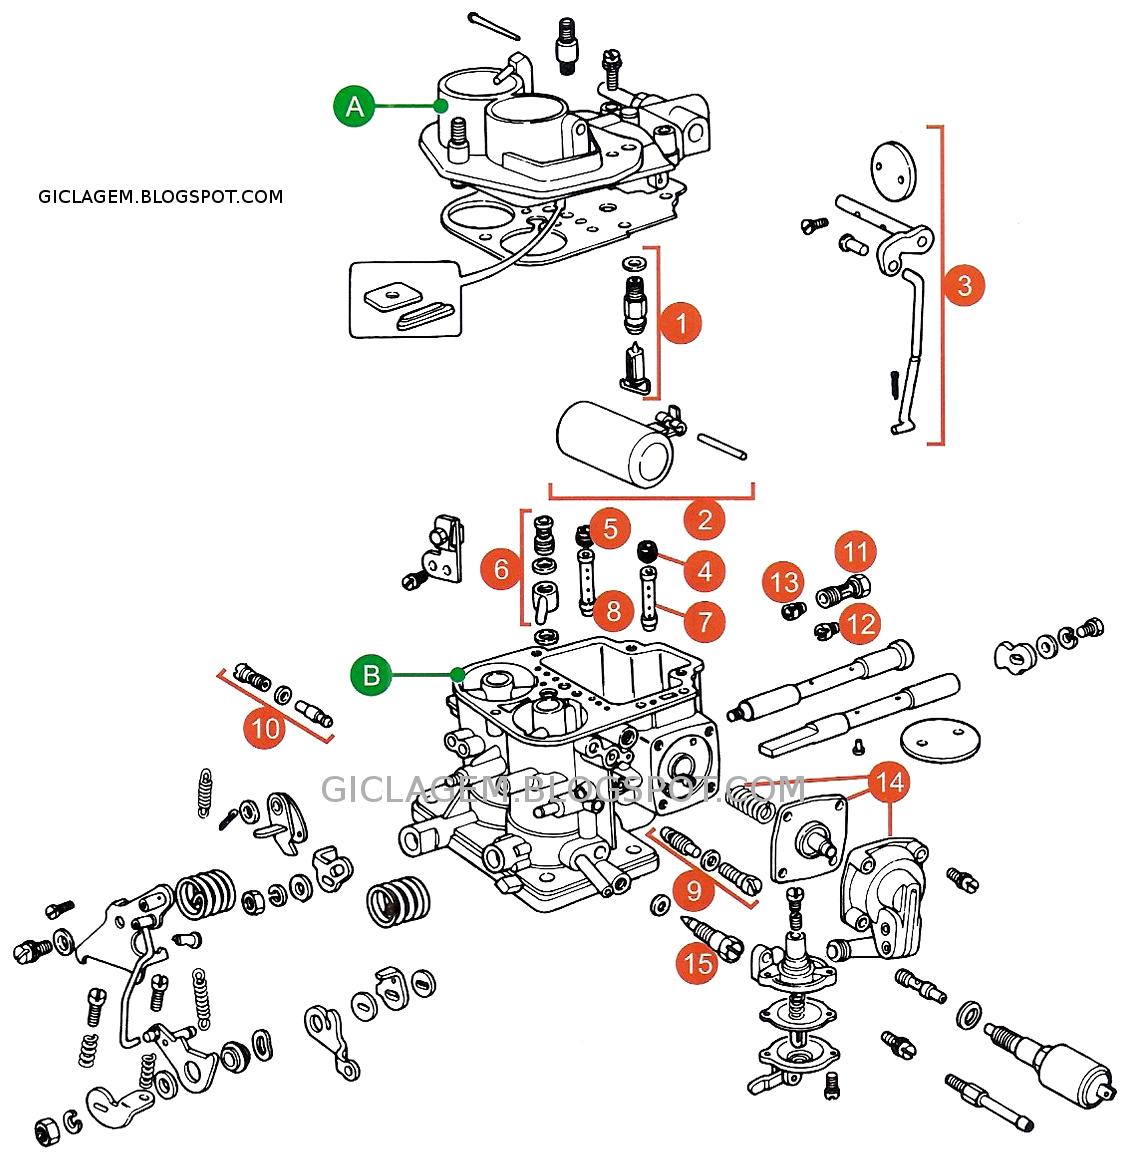 1973 Karmann Ghia Wiring Diagram. Diagrams. Auto Fuse Box